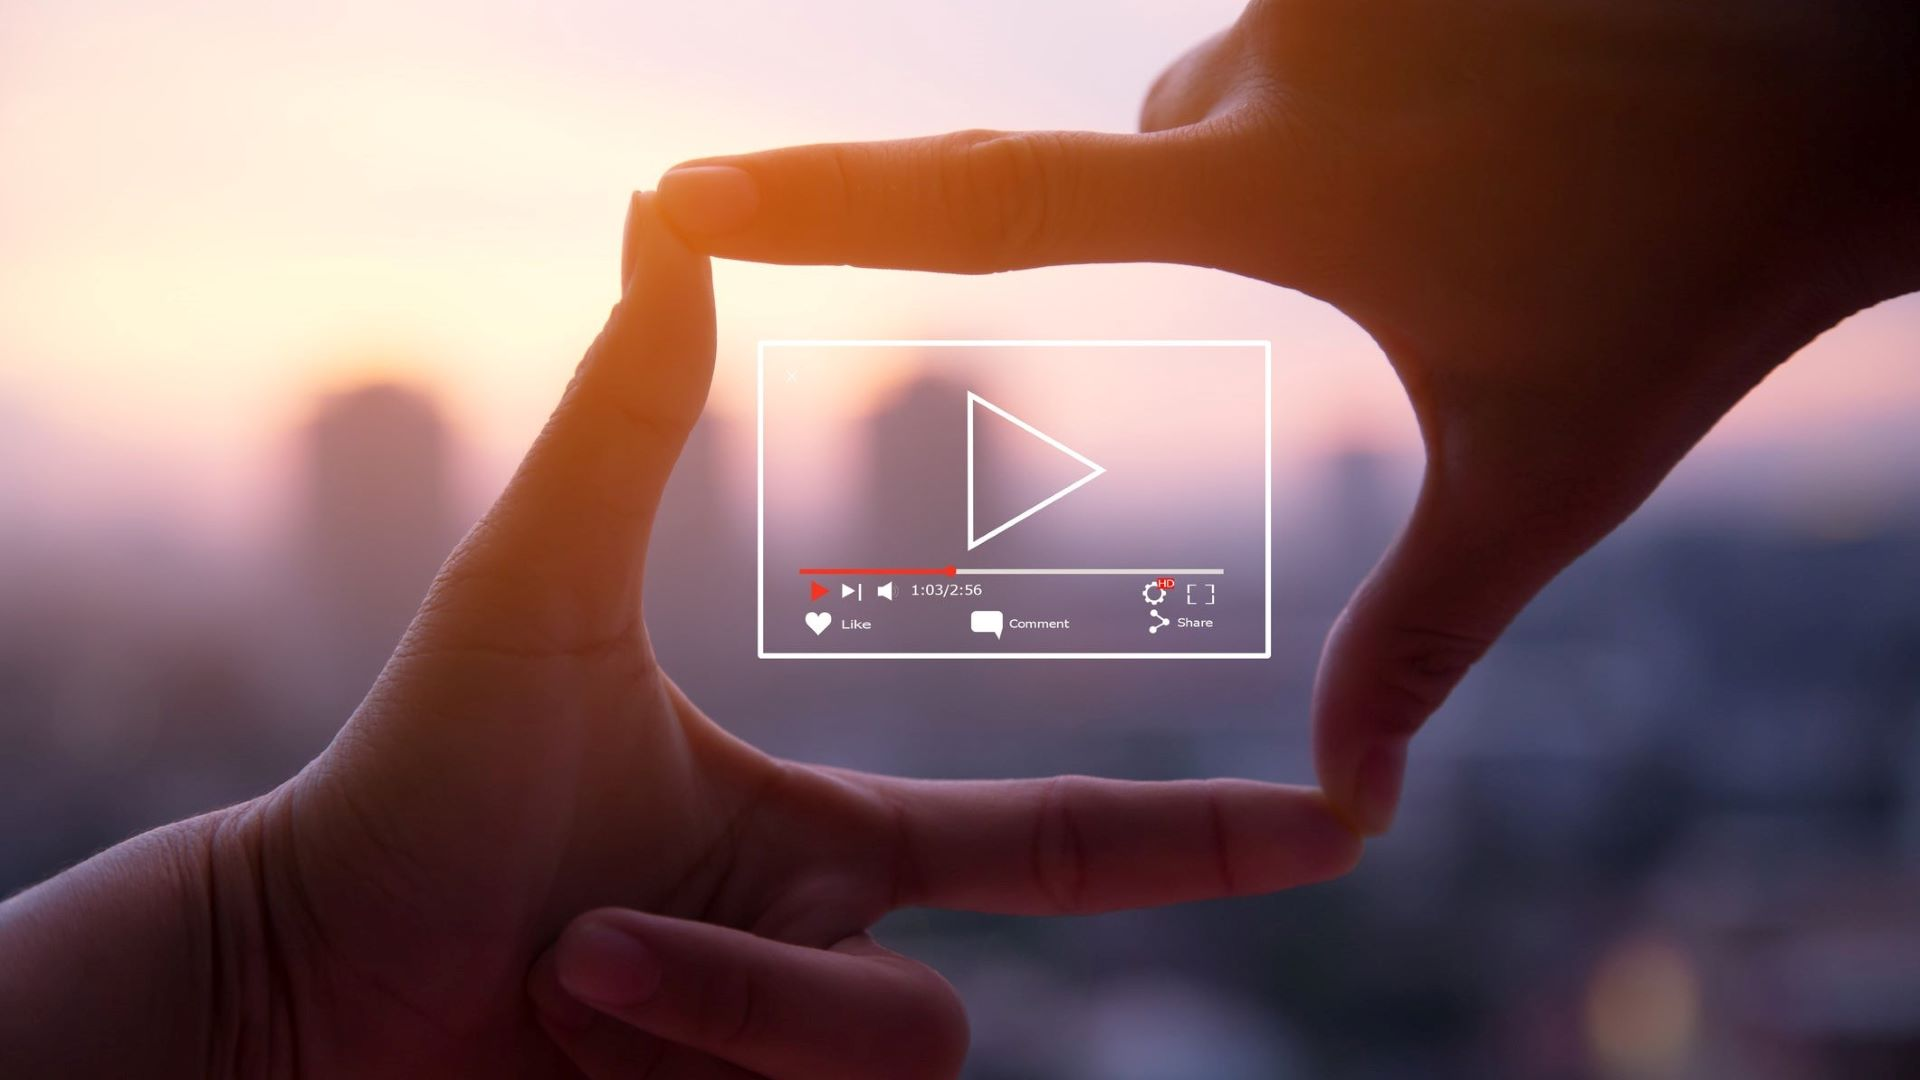 Viewer's hands framing a trending marketing video